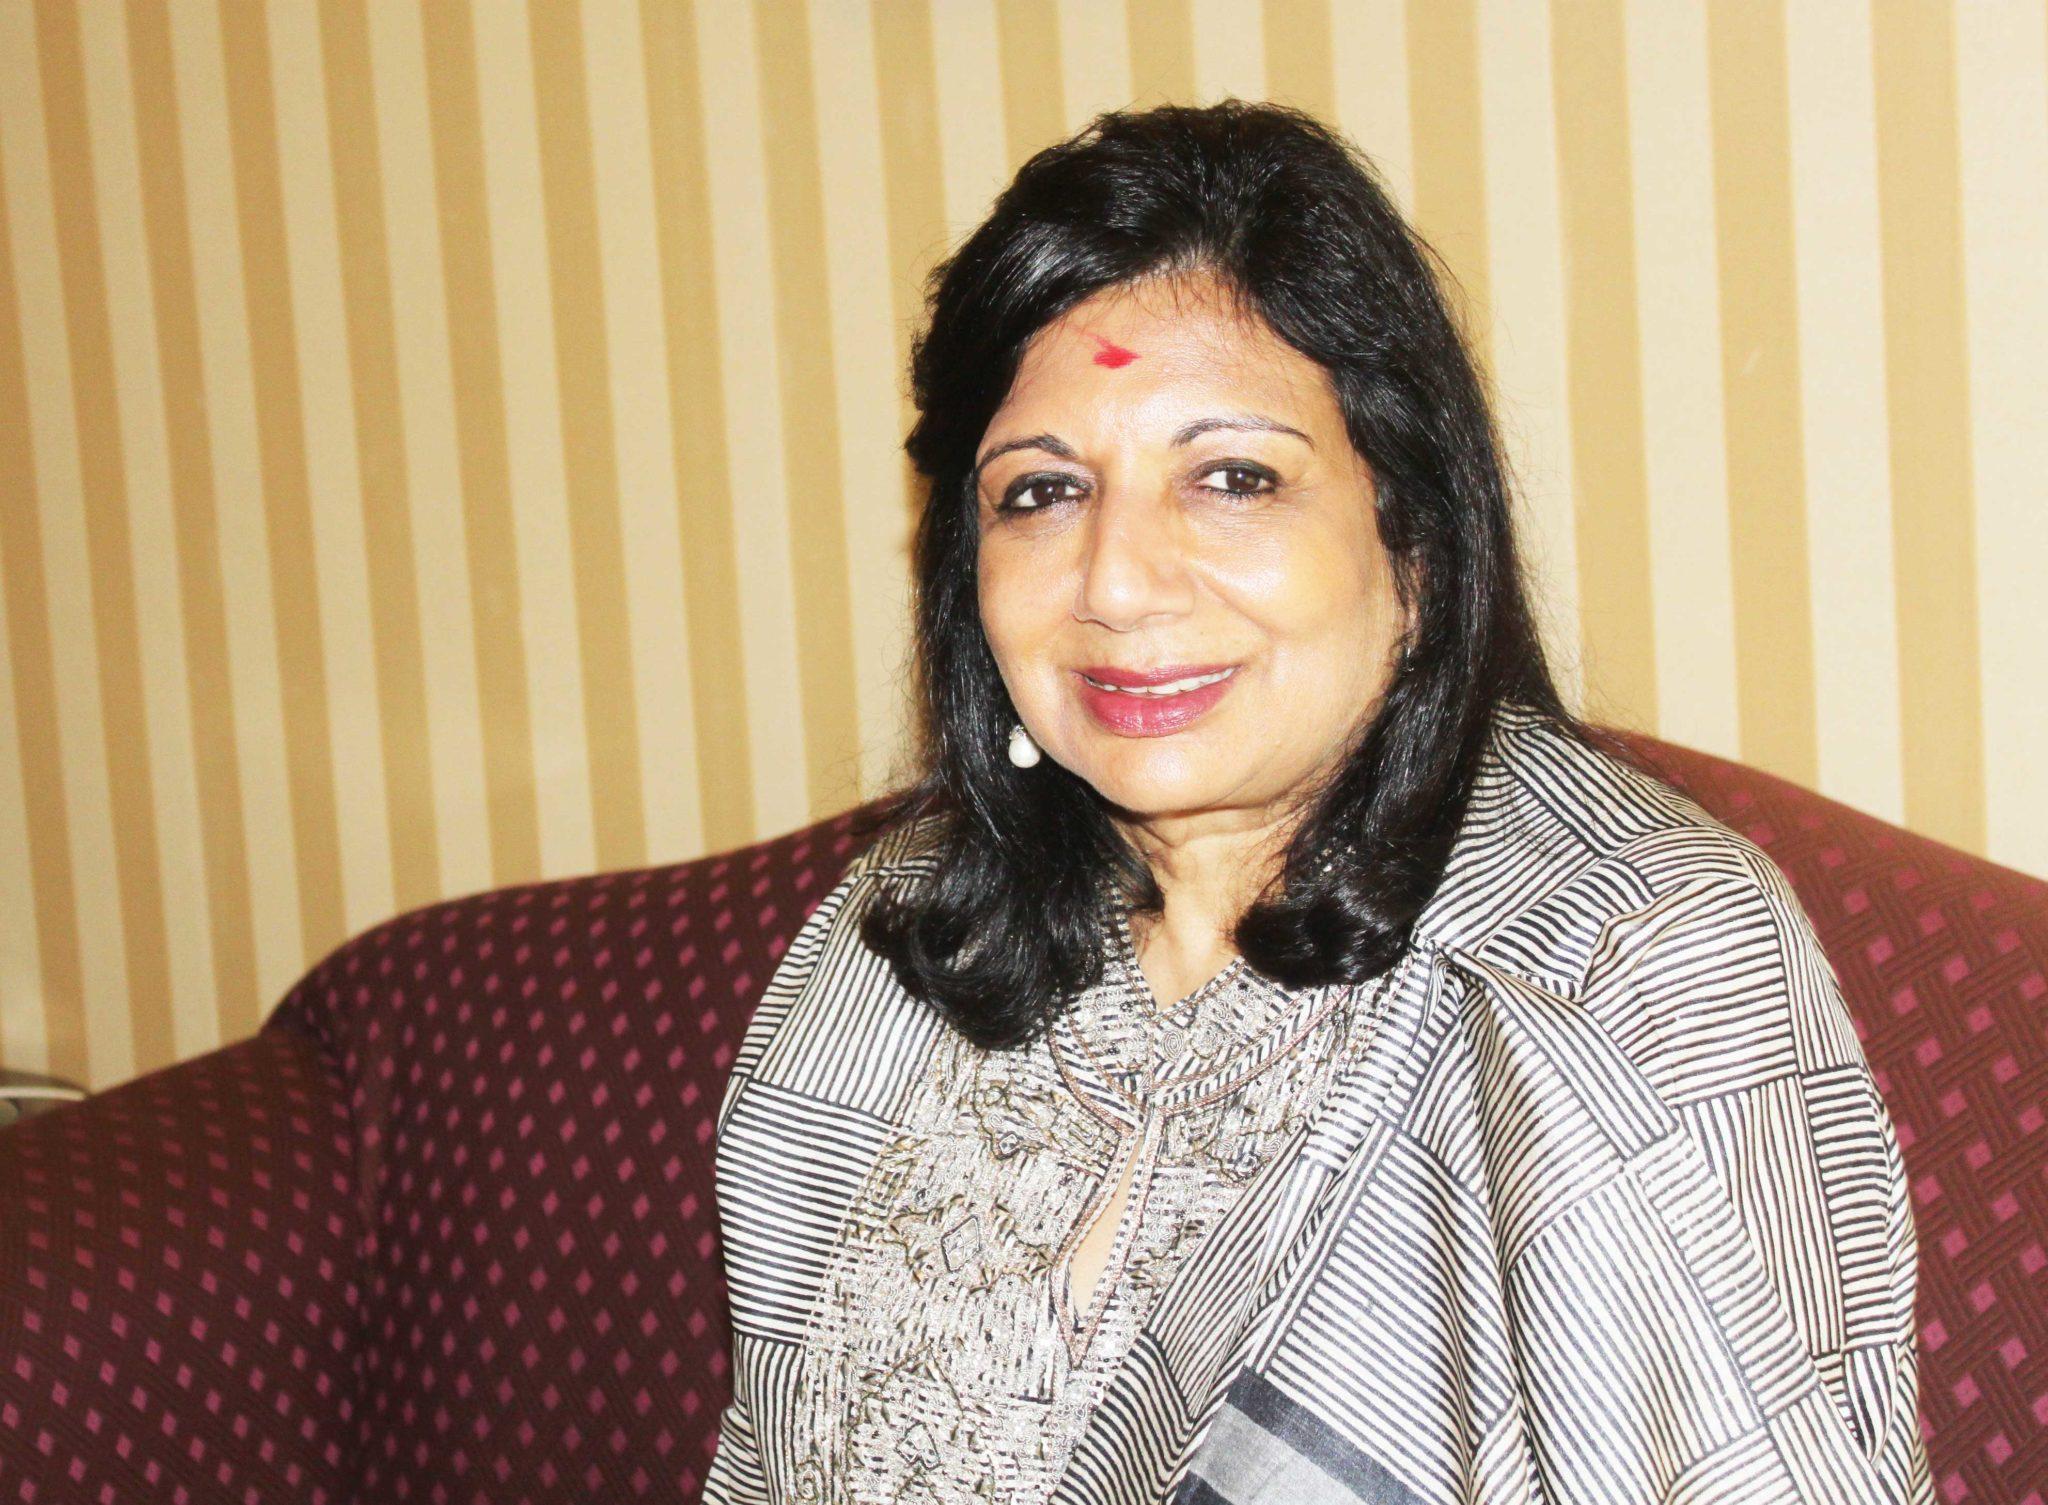 Kiran Mazumdar Shaw, Chairman & Managing Director of Biocon Limited